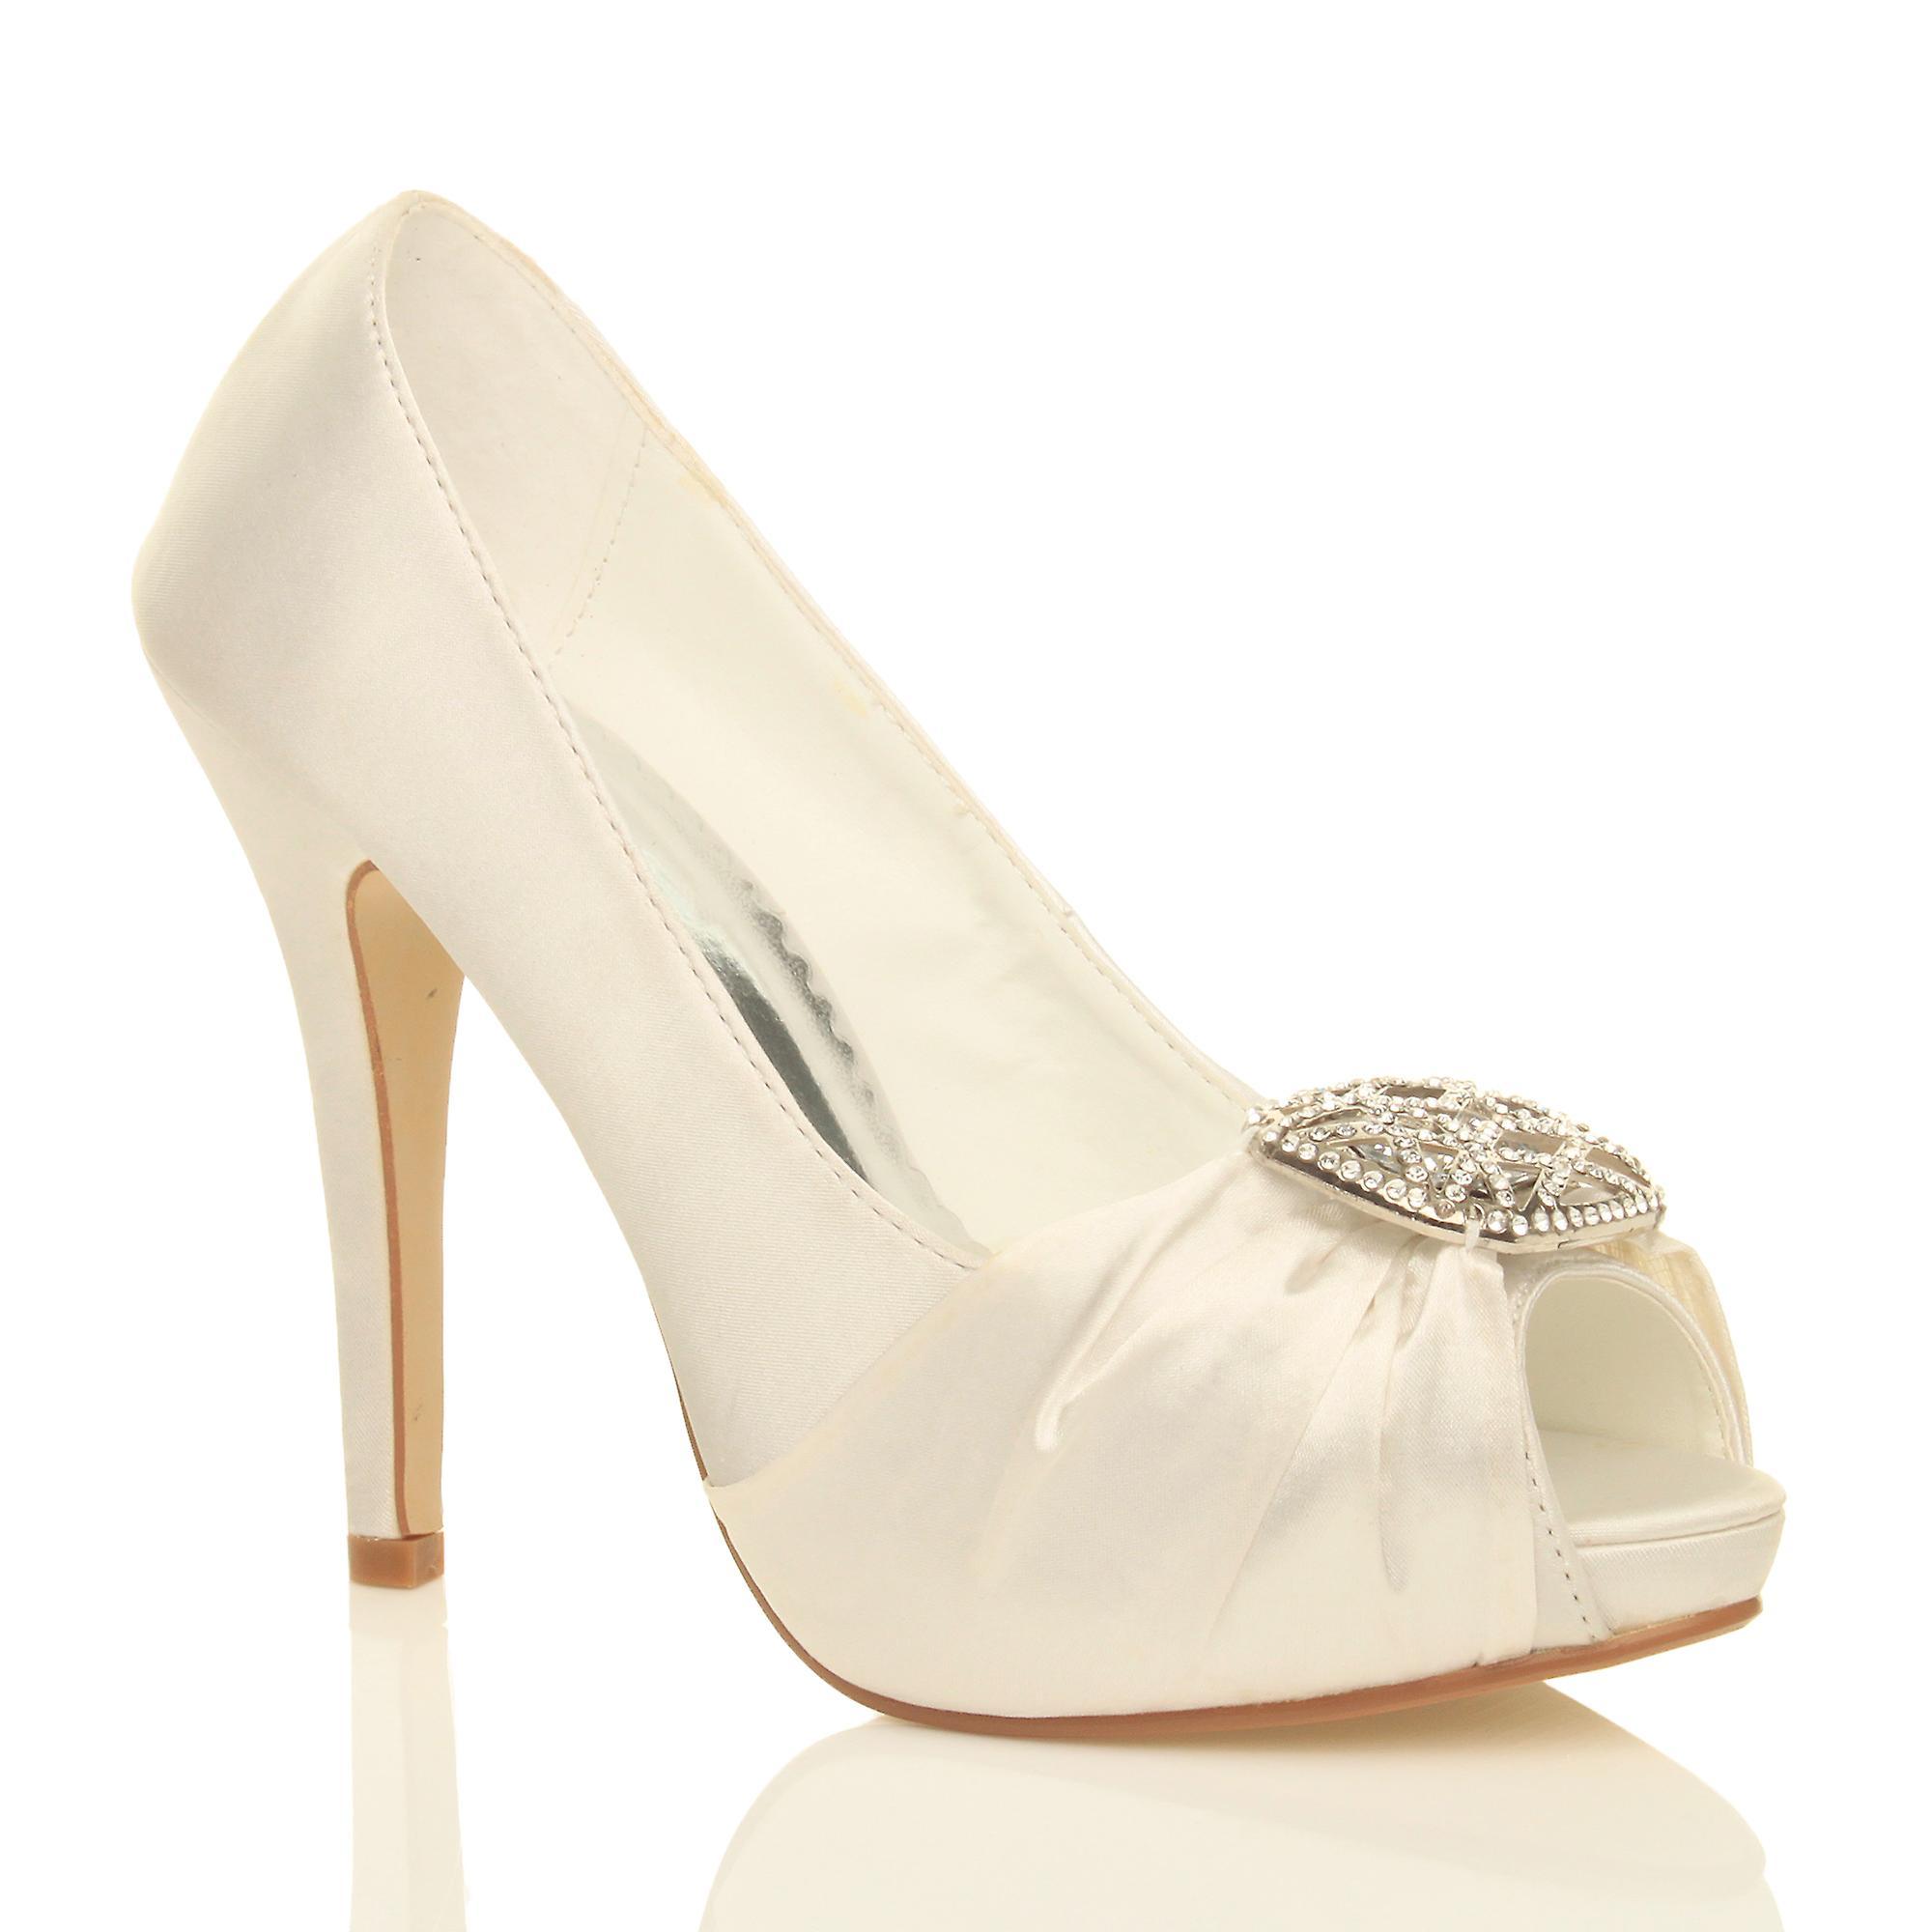 Ajvani Damen high Heels Diamante geraffte Braut Hochzeit Prom Abend Peep Toe Gericht Schuhe pumps